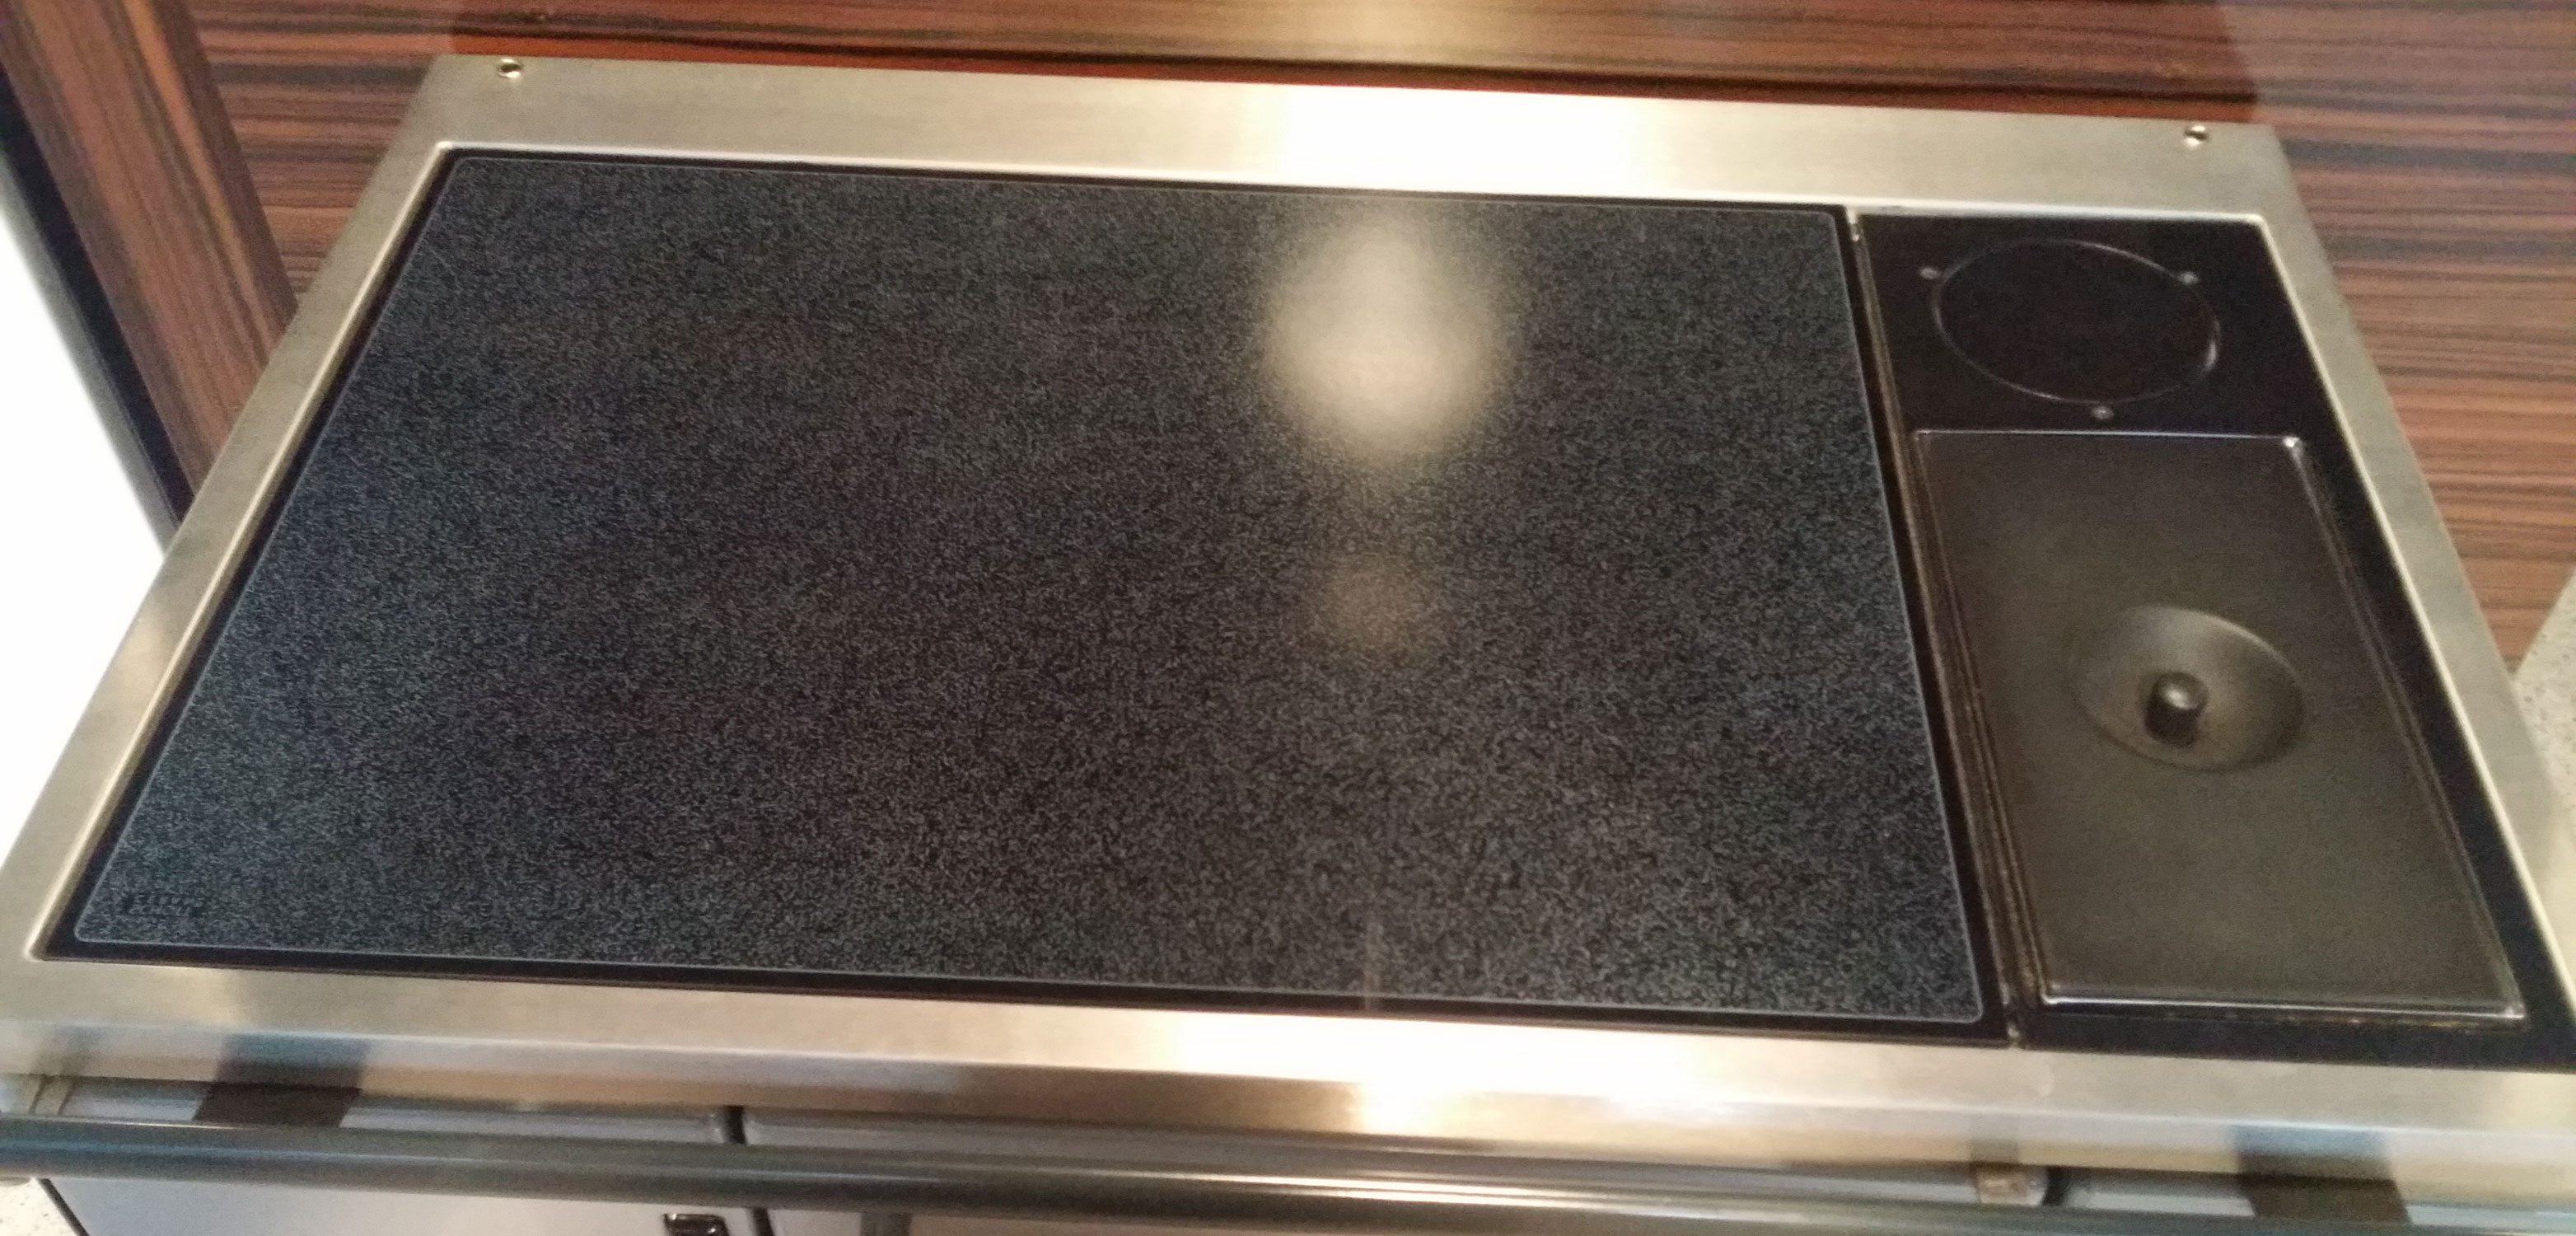 Küchenherd / Kohleherd Wamsler K138F anthrazit Ceran Ans rechts oben Bild 2